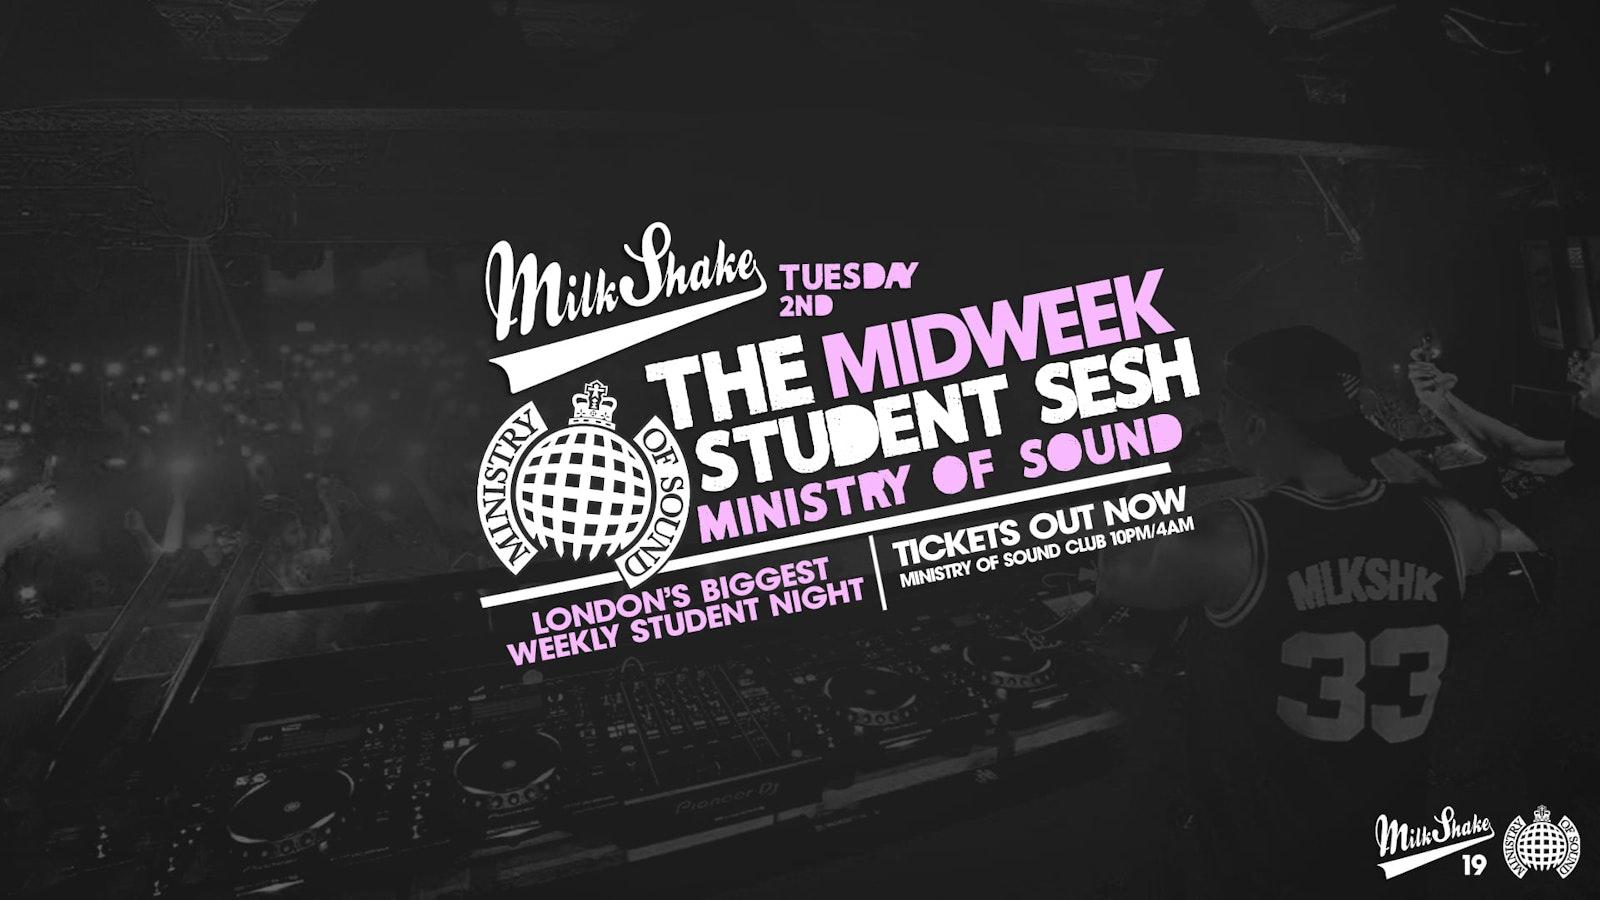 Milkshake, Ministry of Sound | London's Biggest Student Night – November 2nd 2021 🔥